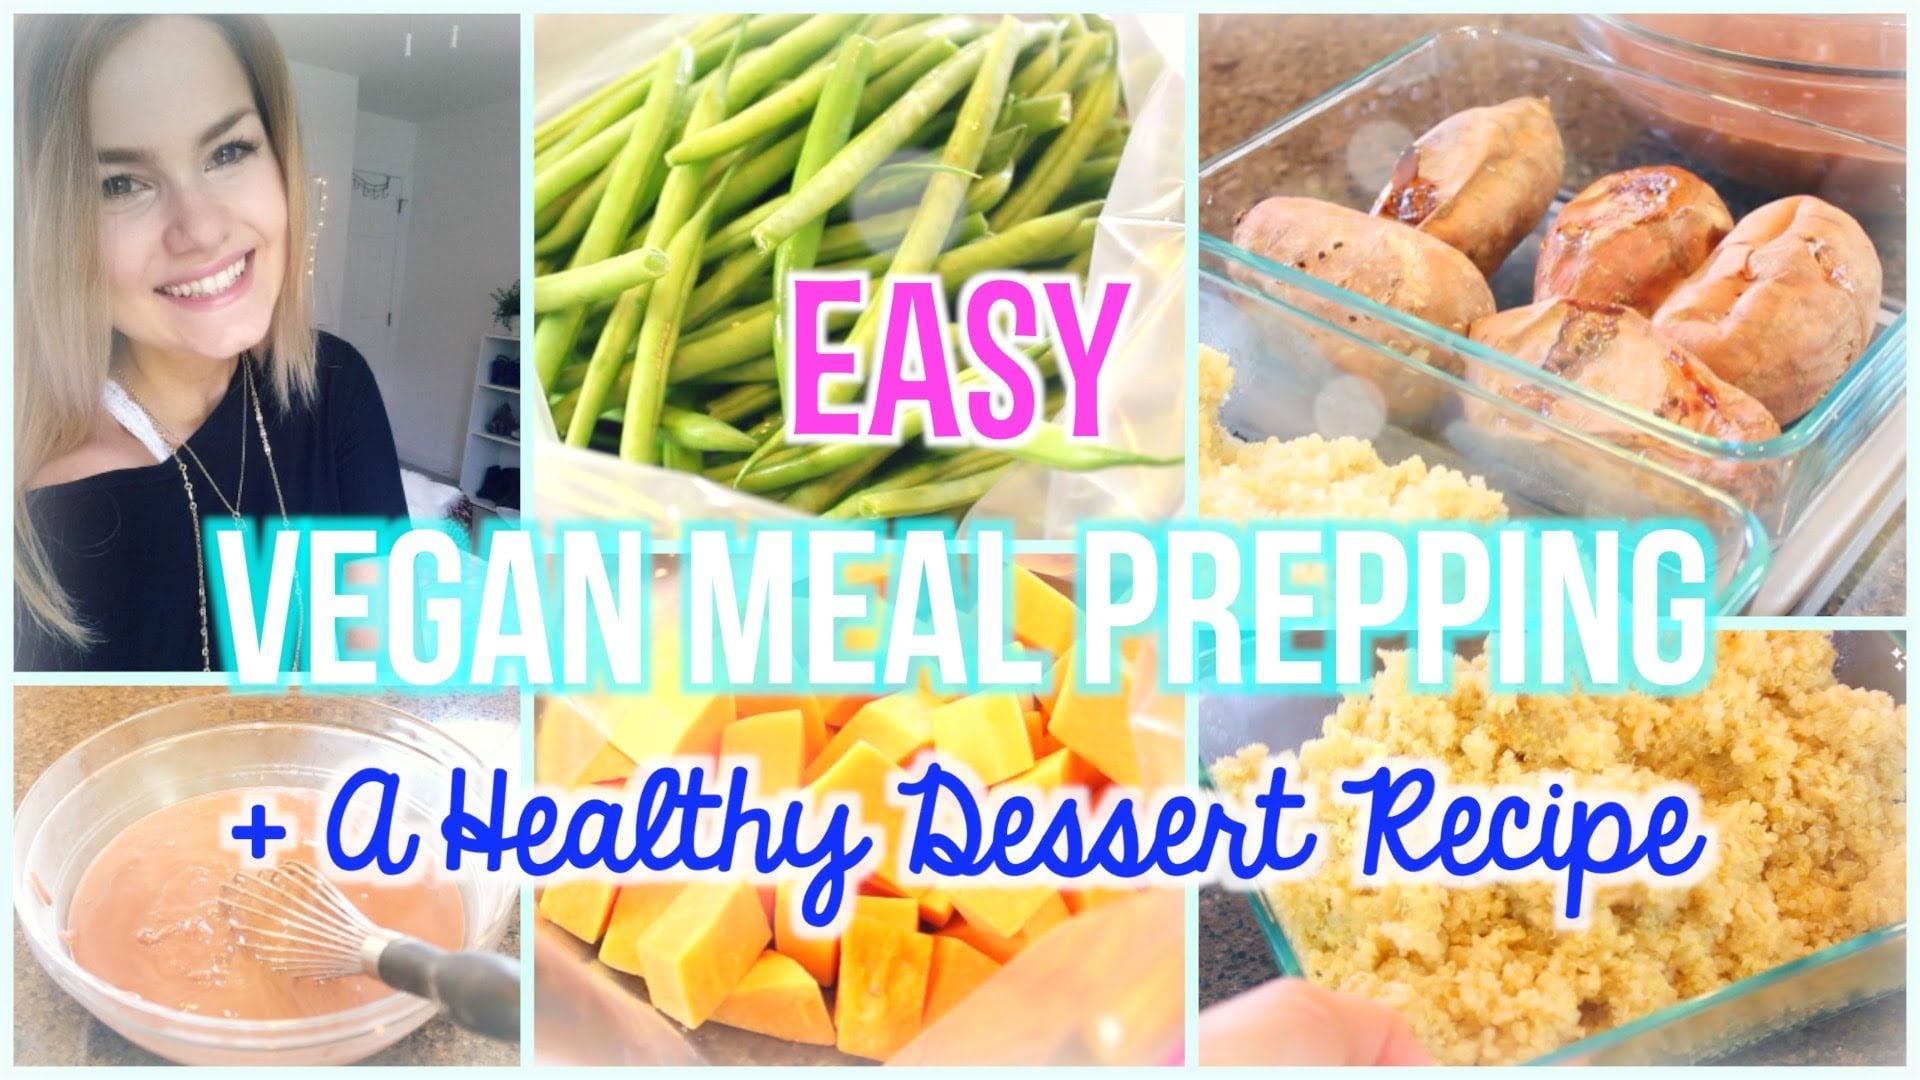 Easy Meal Prepping (Vegan & Gluten Free + a Healthy Dessert Recipe)